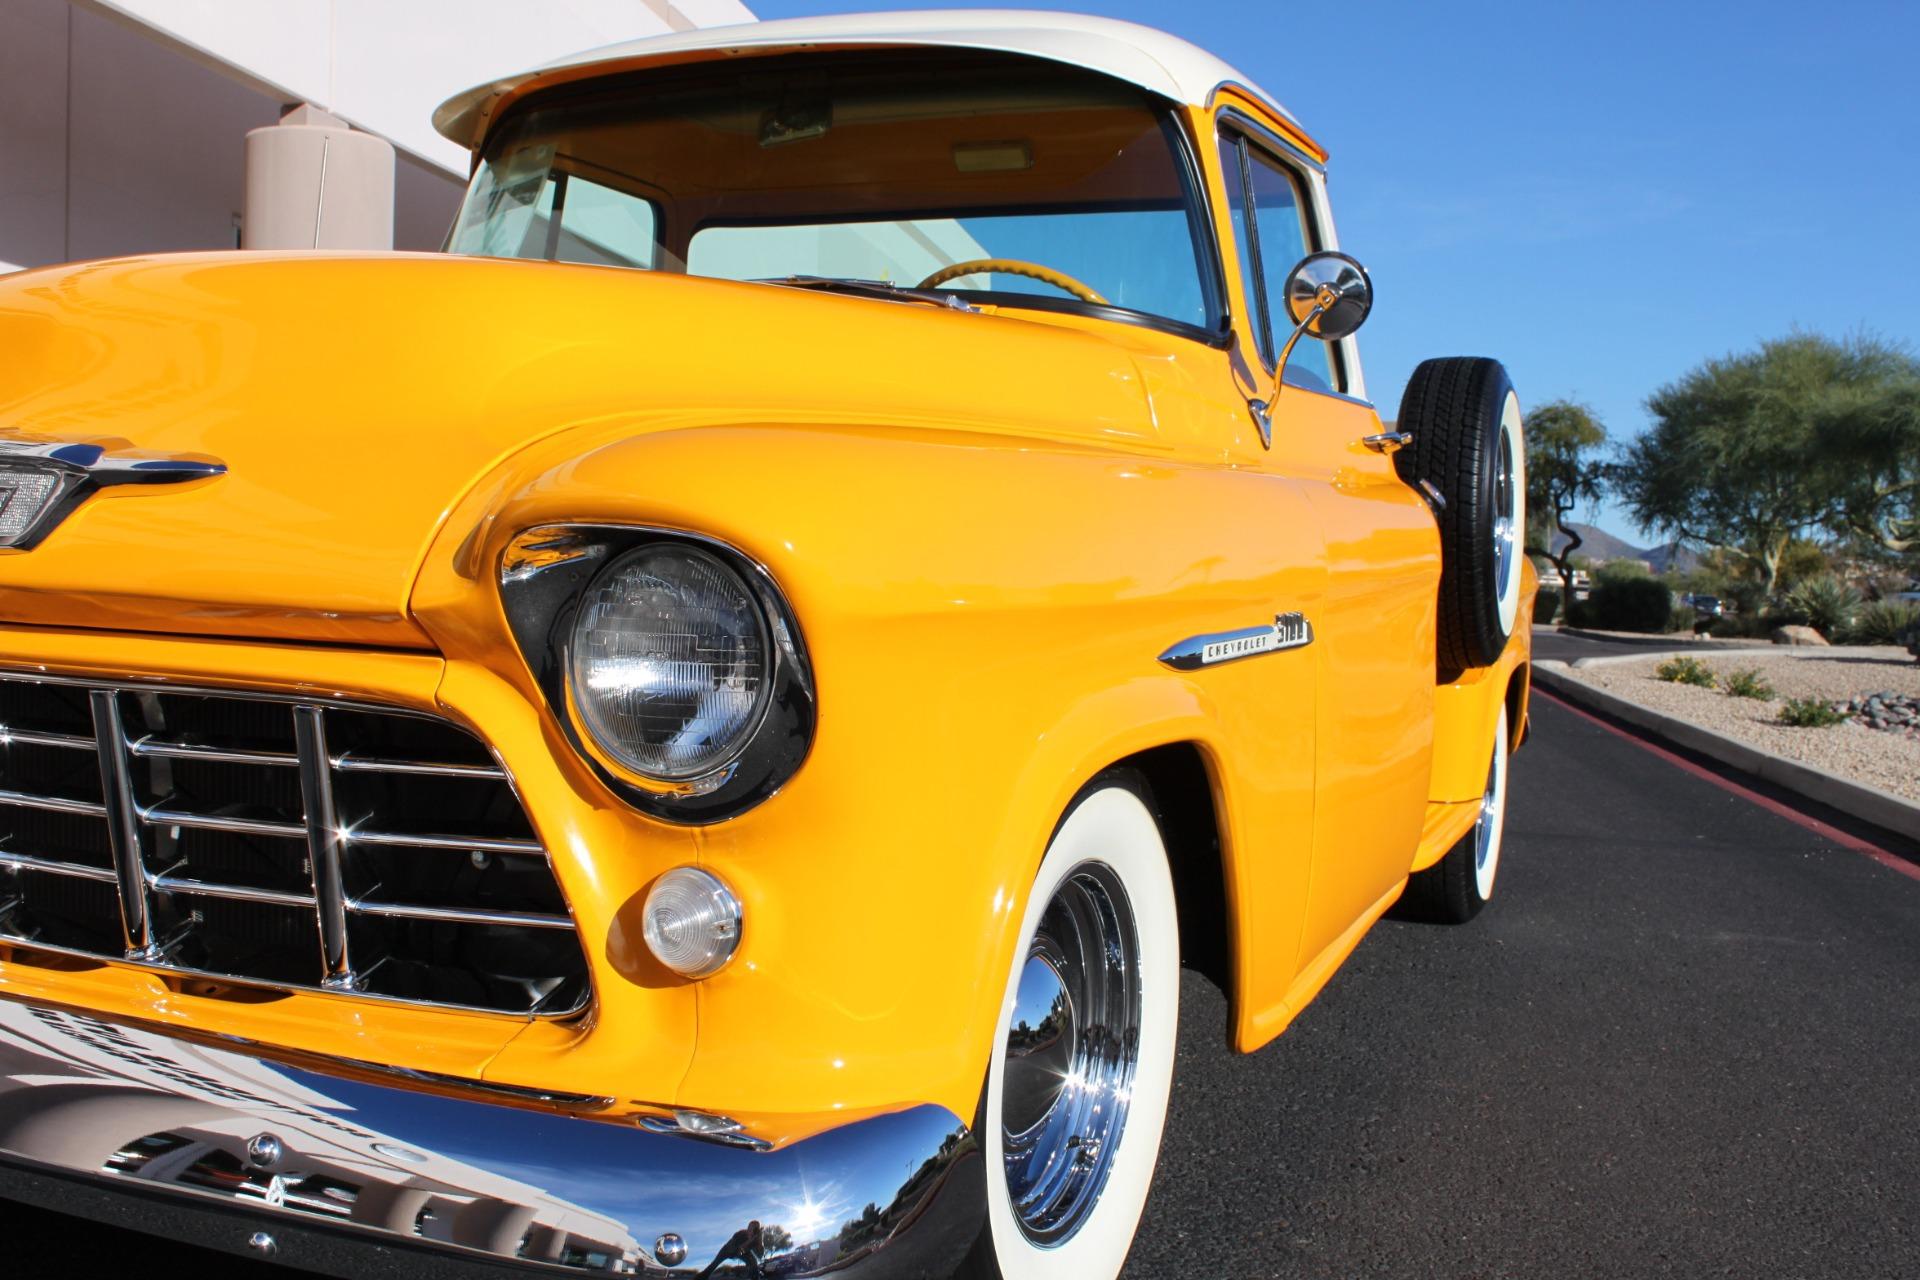 Used-1955-Chevrolet-3100-Pickup-Truck-Chevrolet